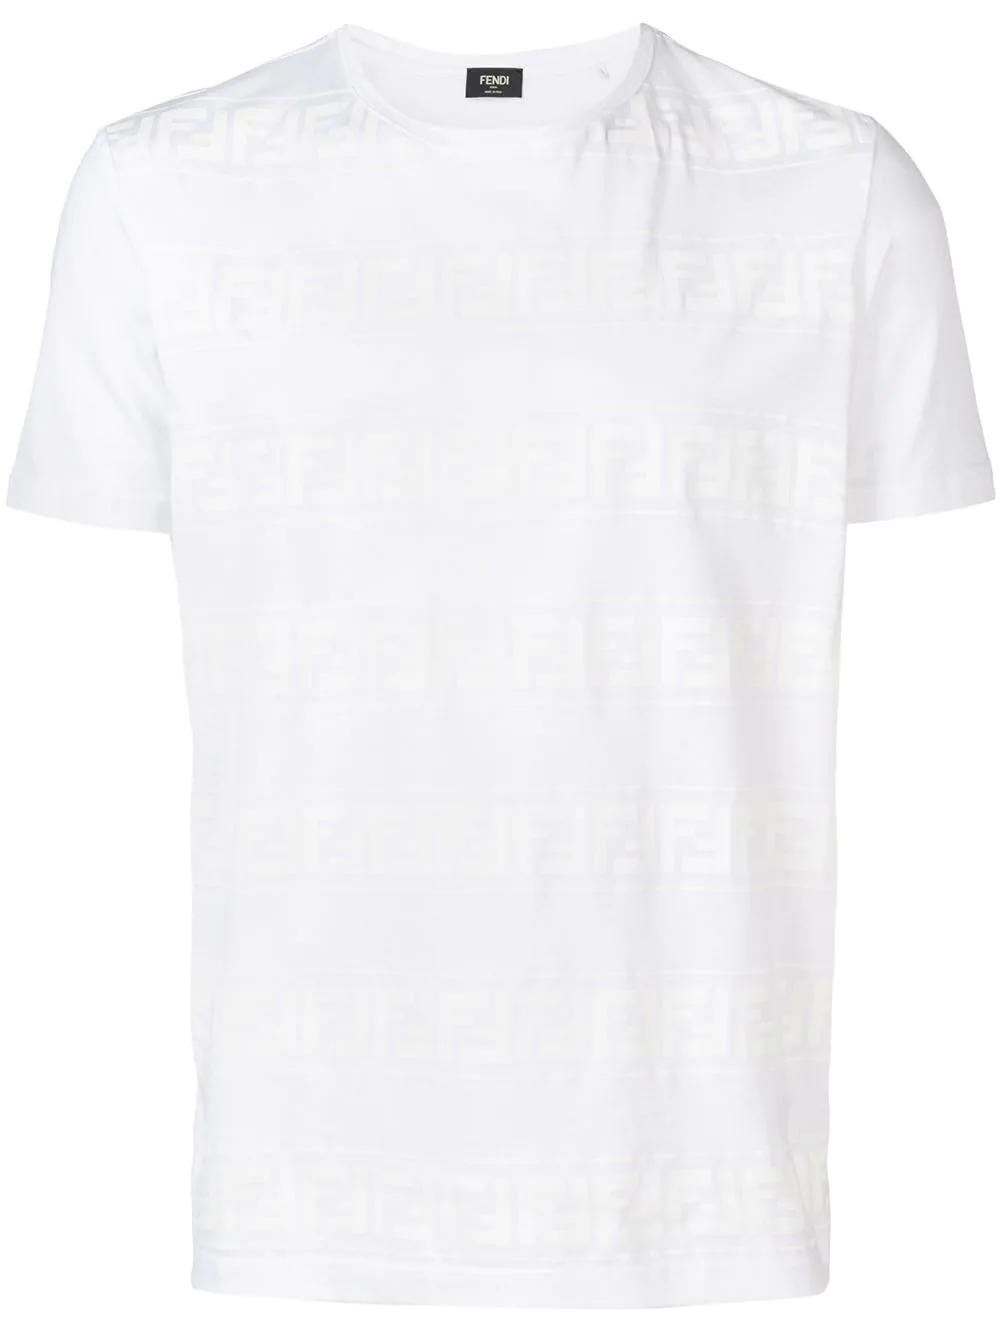 9984661b Fendi White T-Shirt With Ff Logo | ModeSens